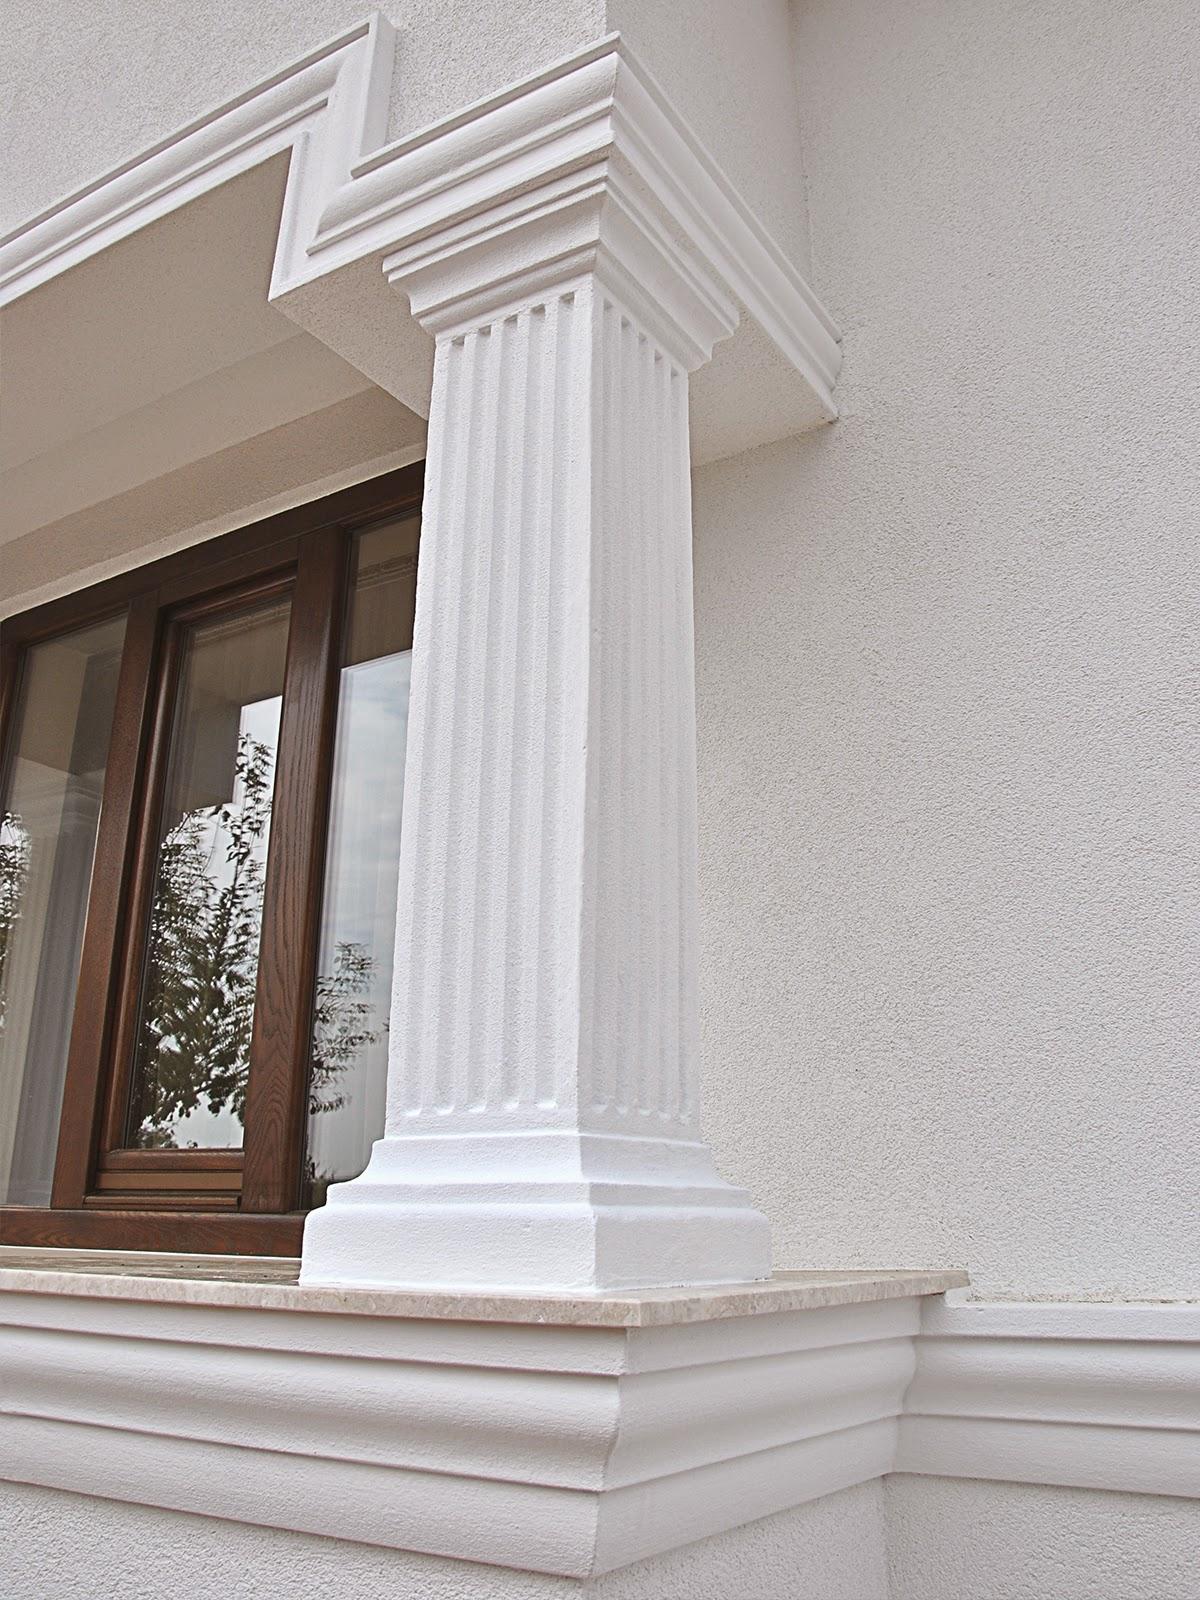 Coloane decorative patrate din polistiren penrtu fatade case